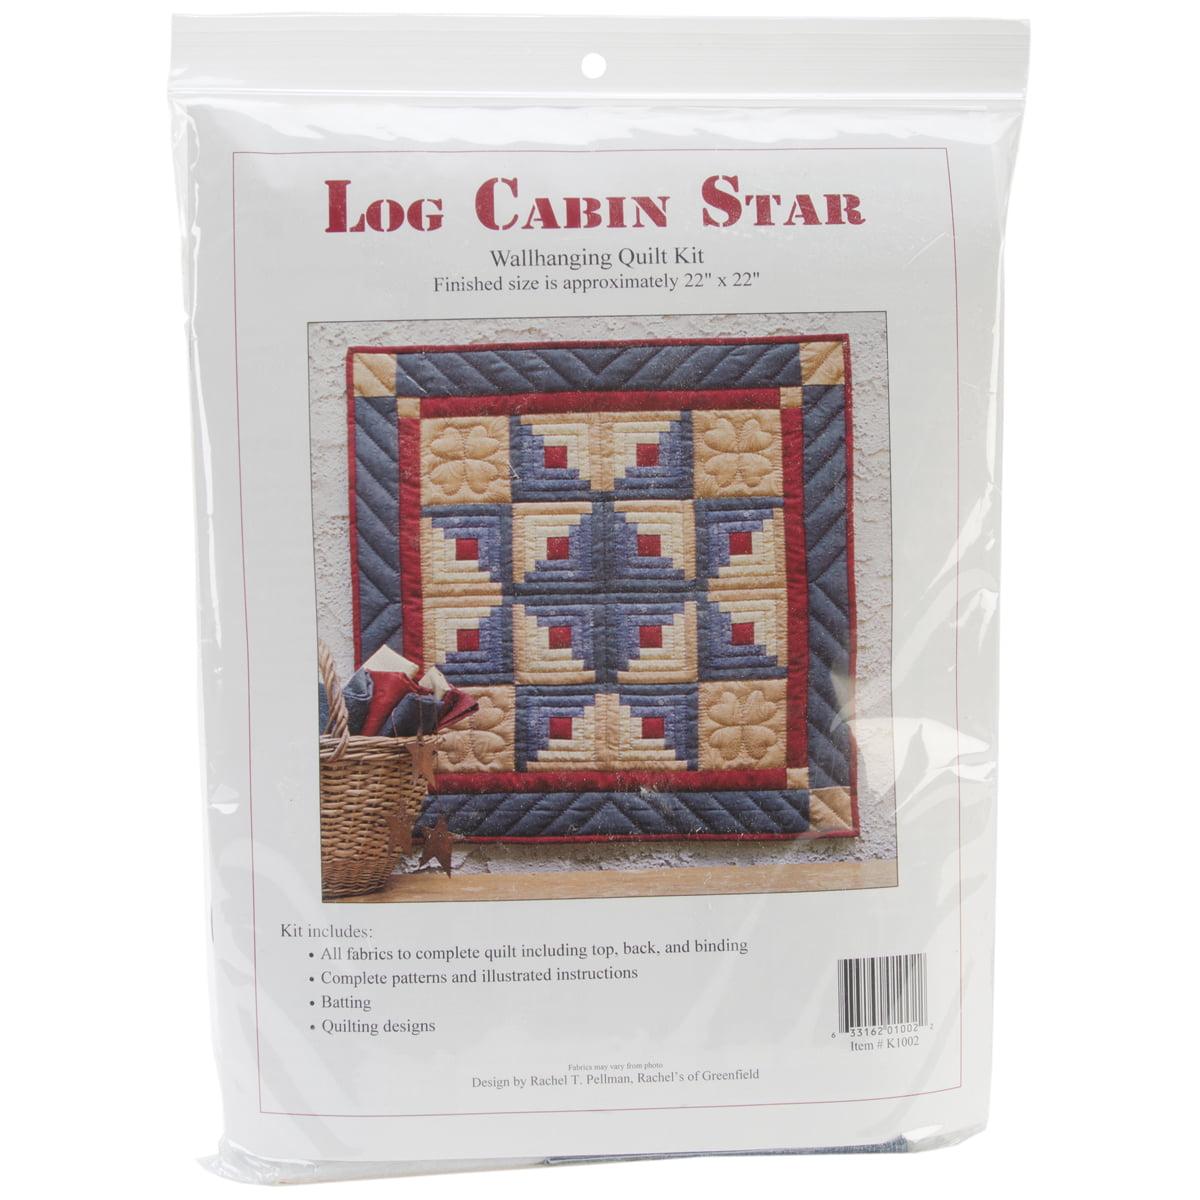 Log Cabin Star Wall Quilt Kit-Log Cabin